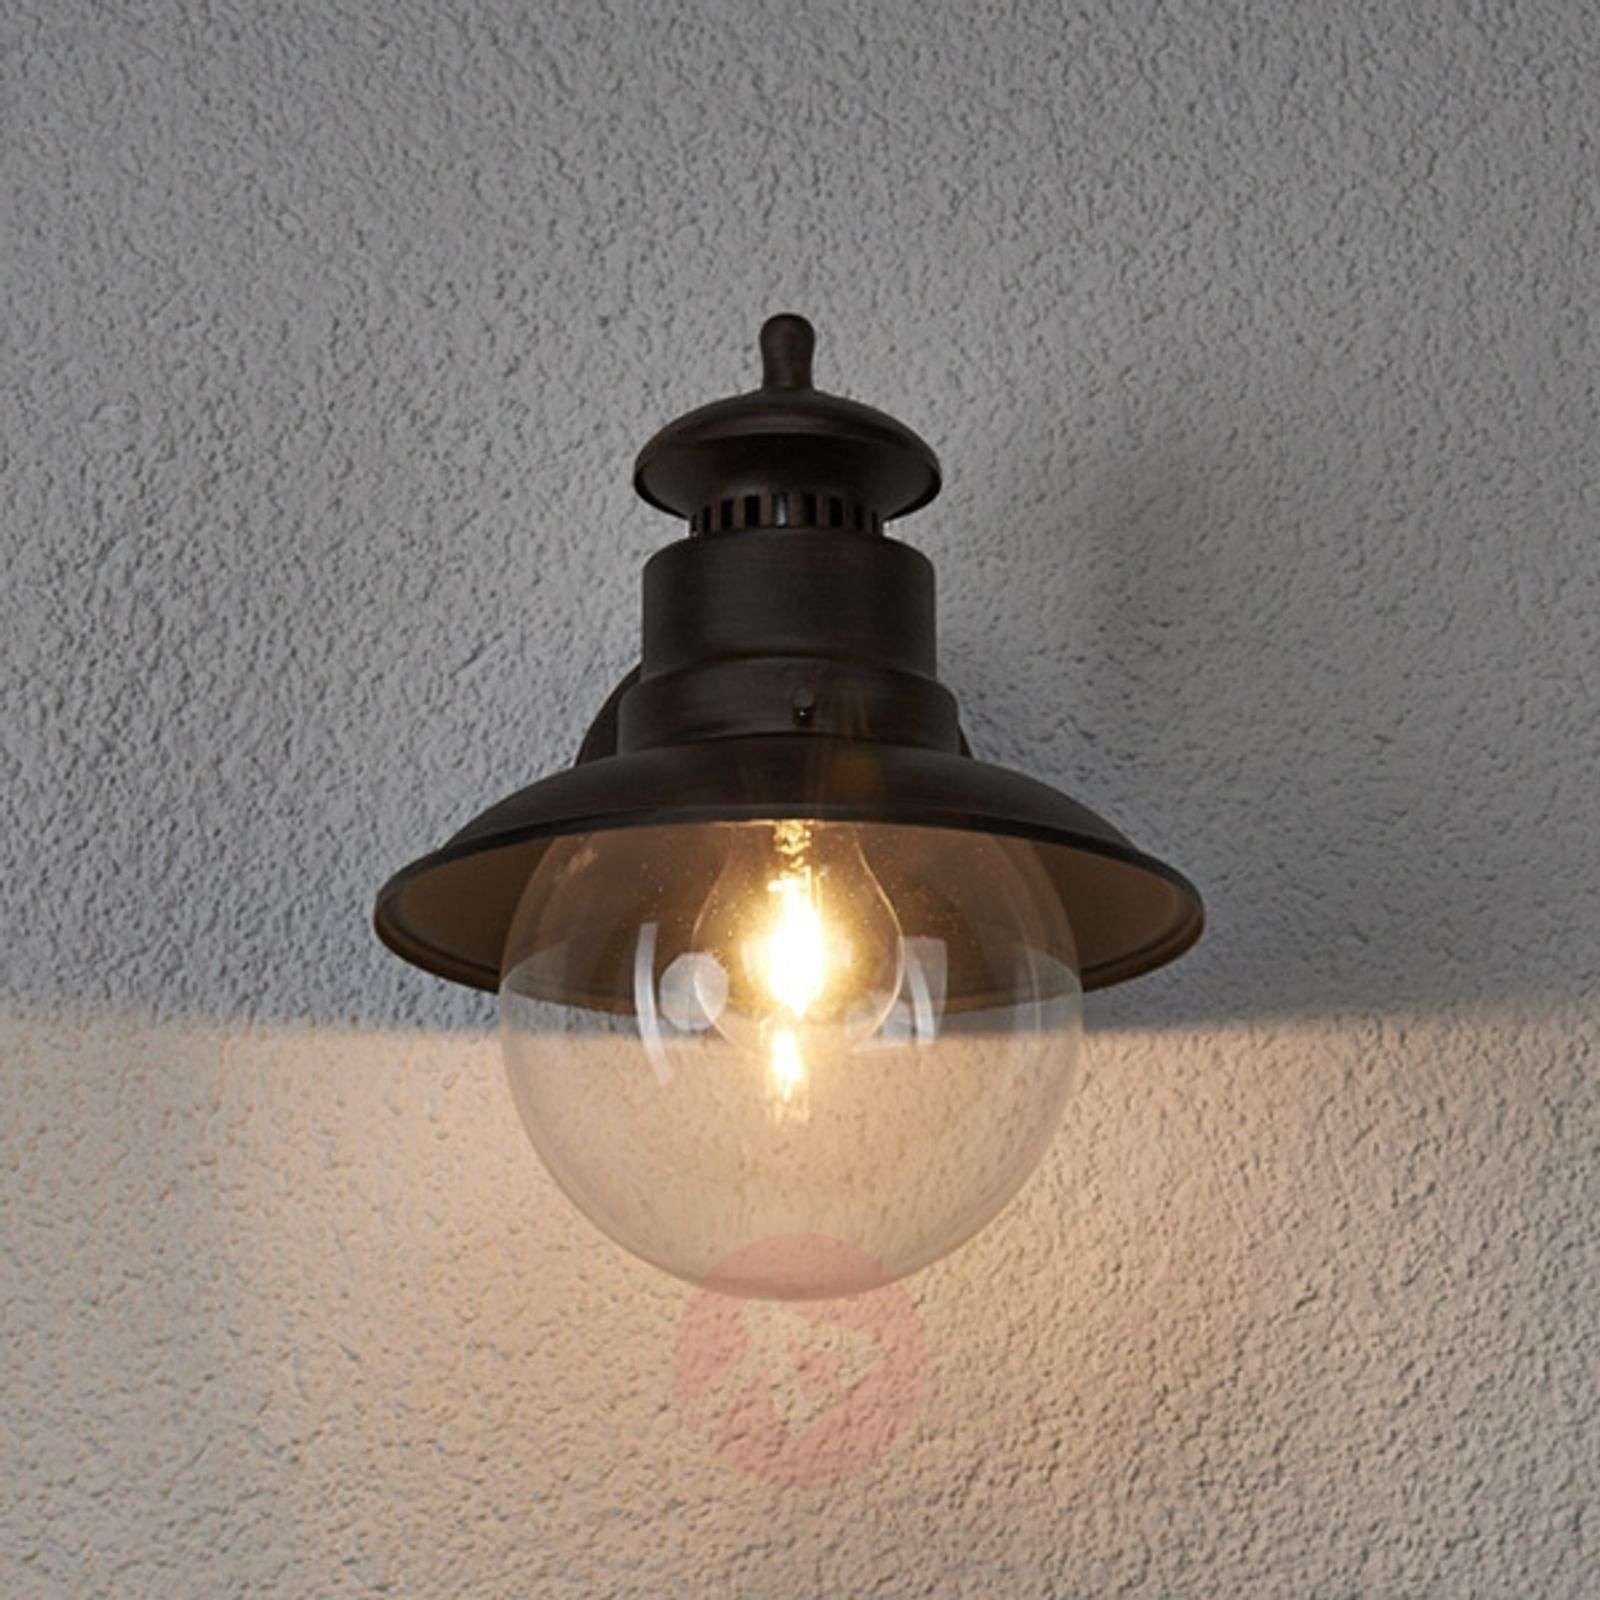 Eddie Outside Wall Light Rustic IP44-9630001-01